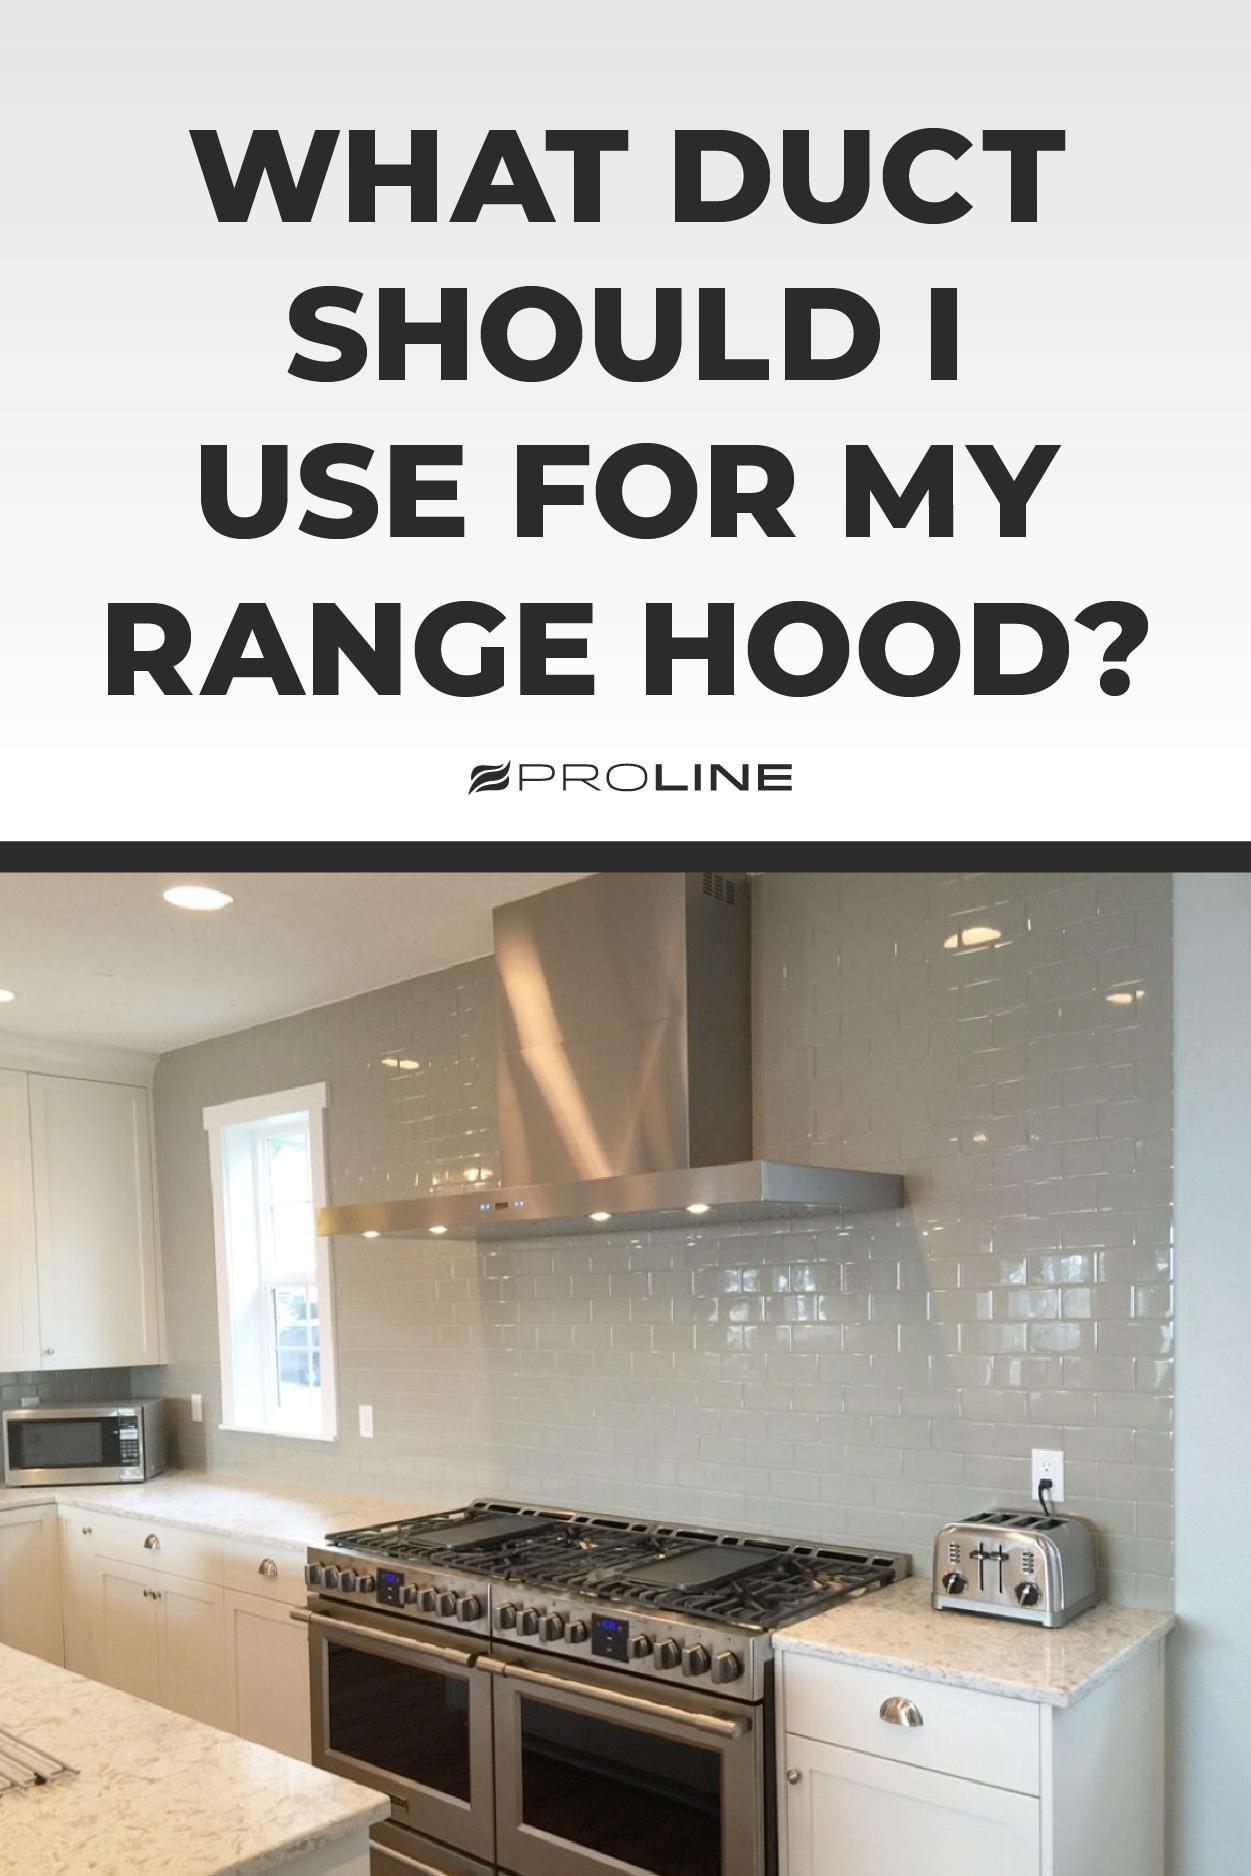 Best 600 Cfm Range Hoods And Buyer S Guide Range Hood Kitchen Remodel Stainless Steel Kitchen Exhaust